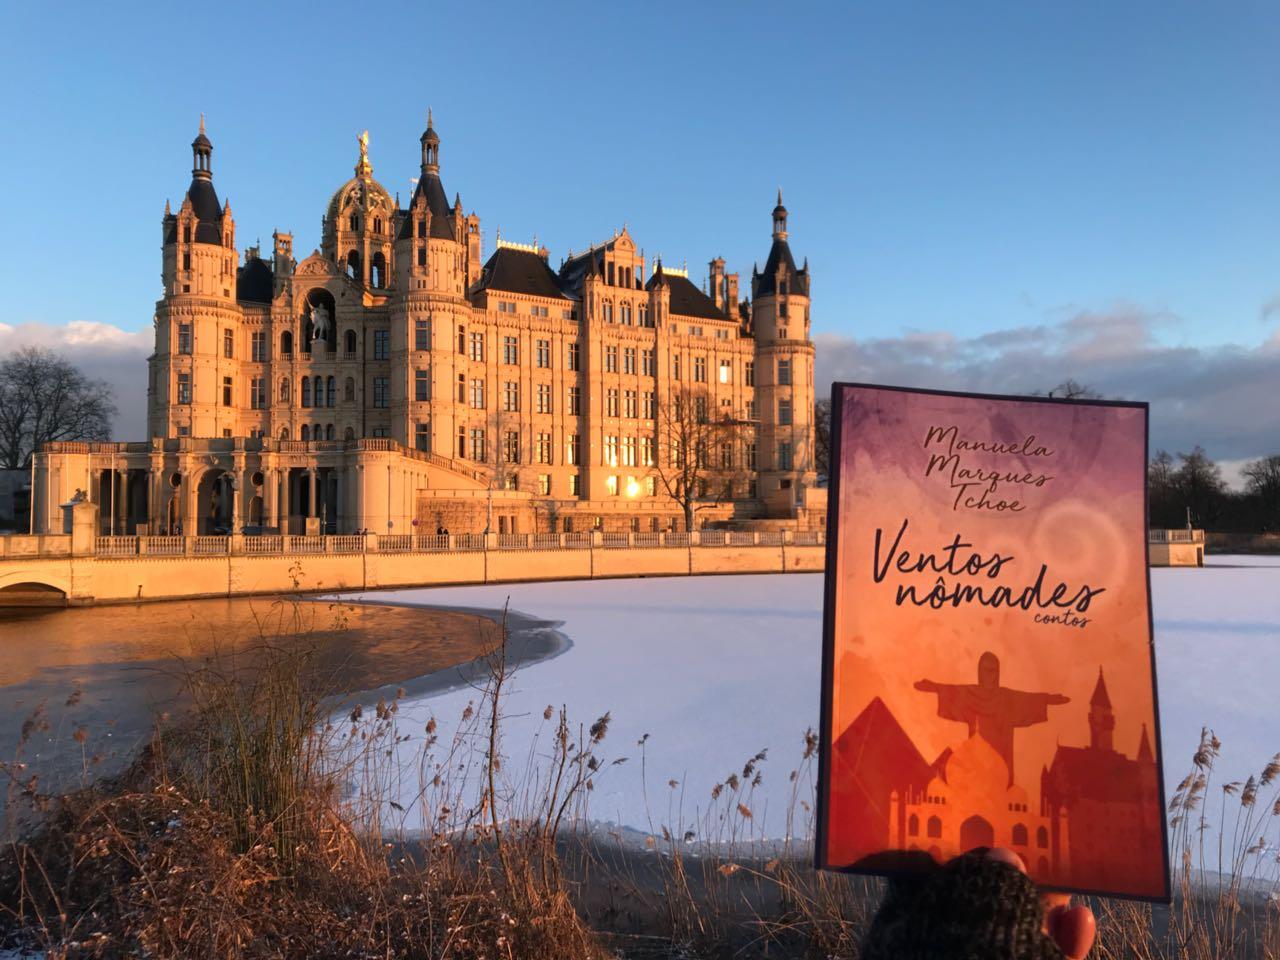 Castelo de Schwerin, capital da província alemã de Mecklenburg-Vorpommern. Foto by: Cris Schlup.